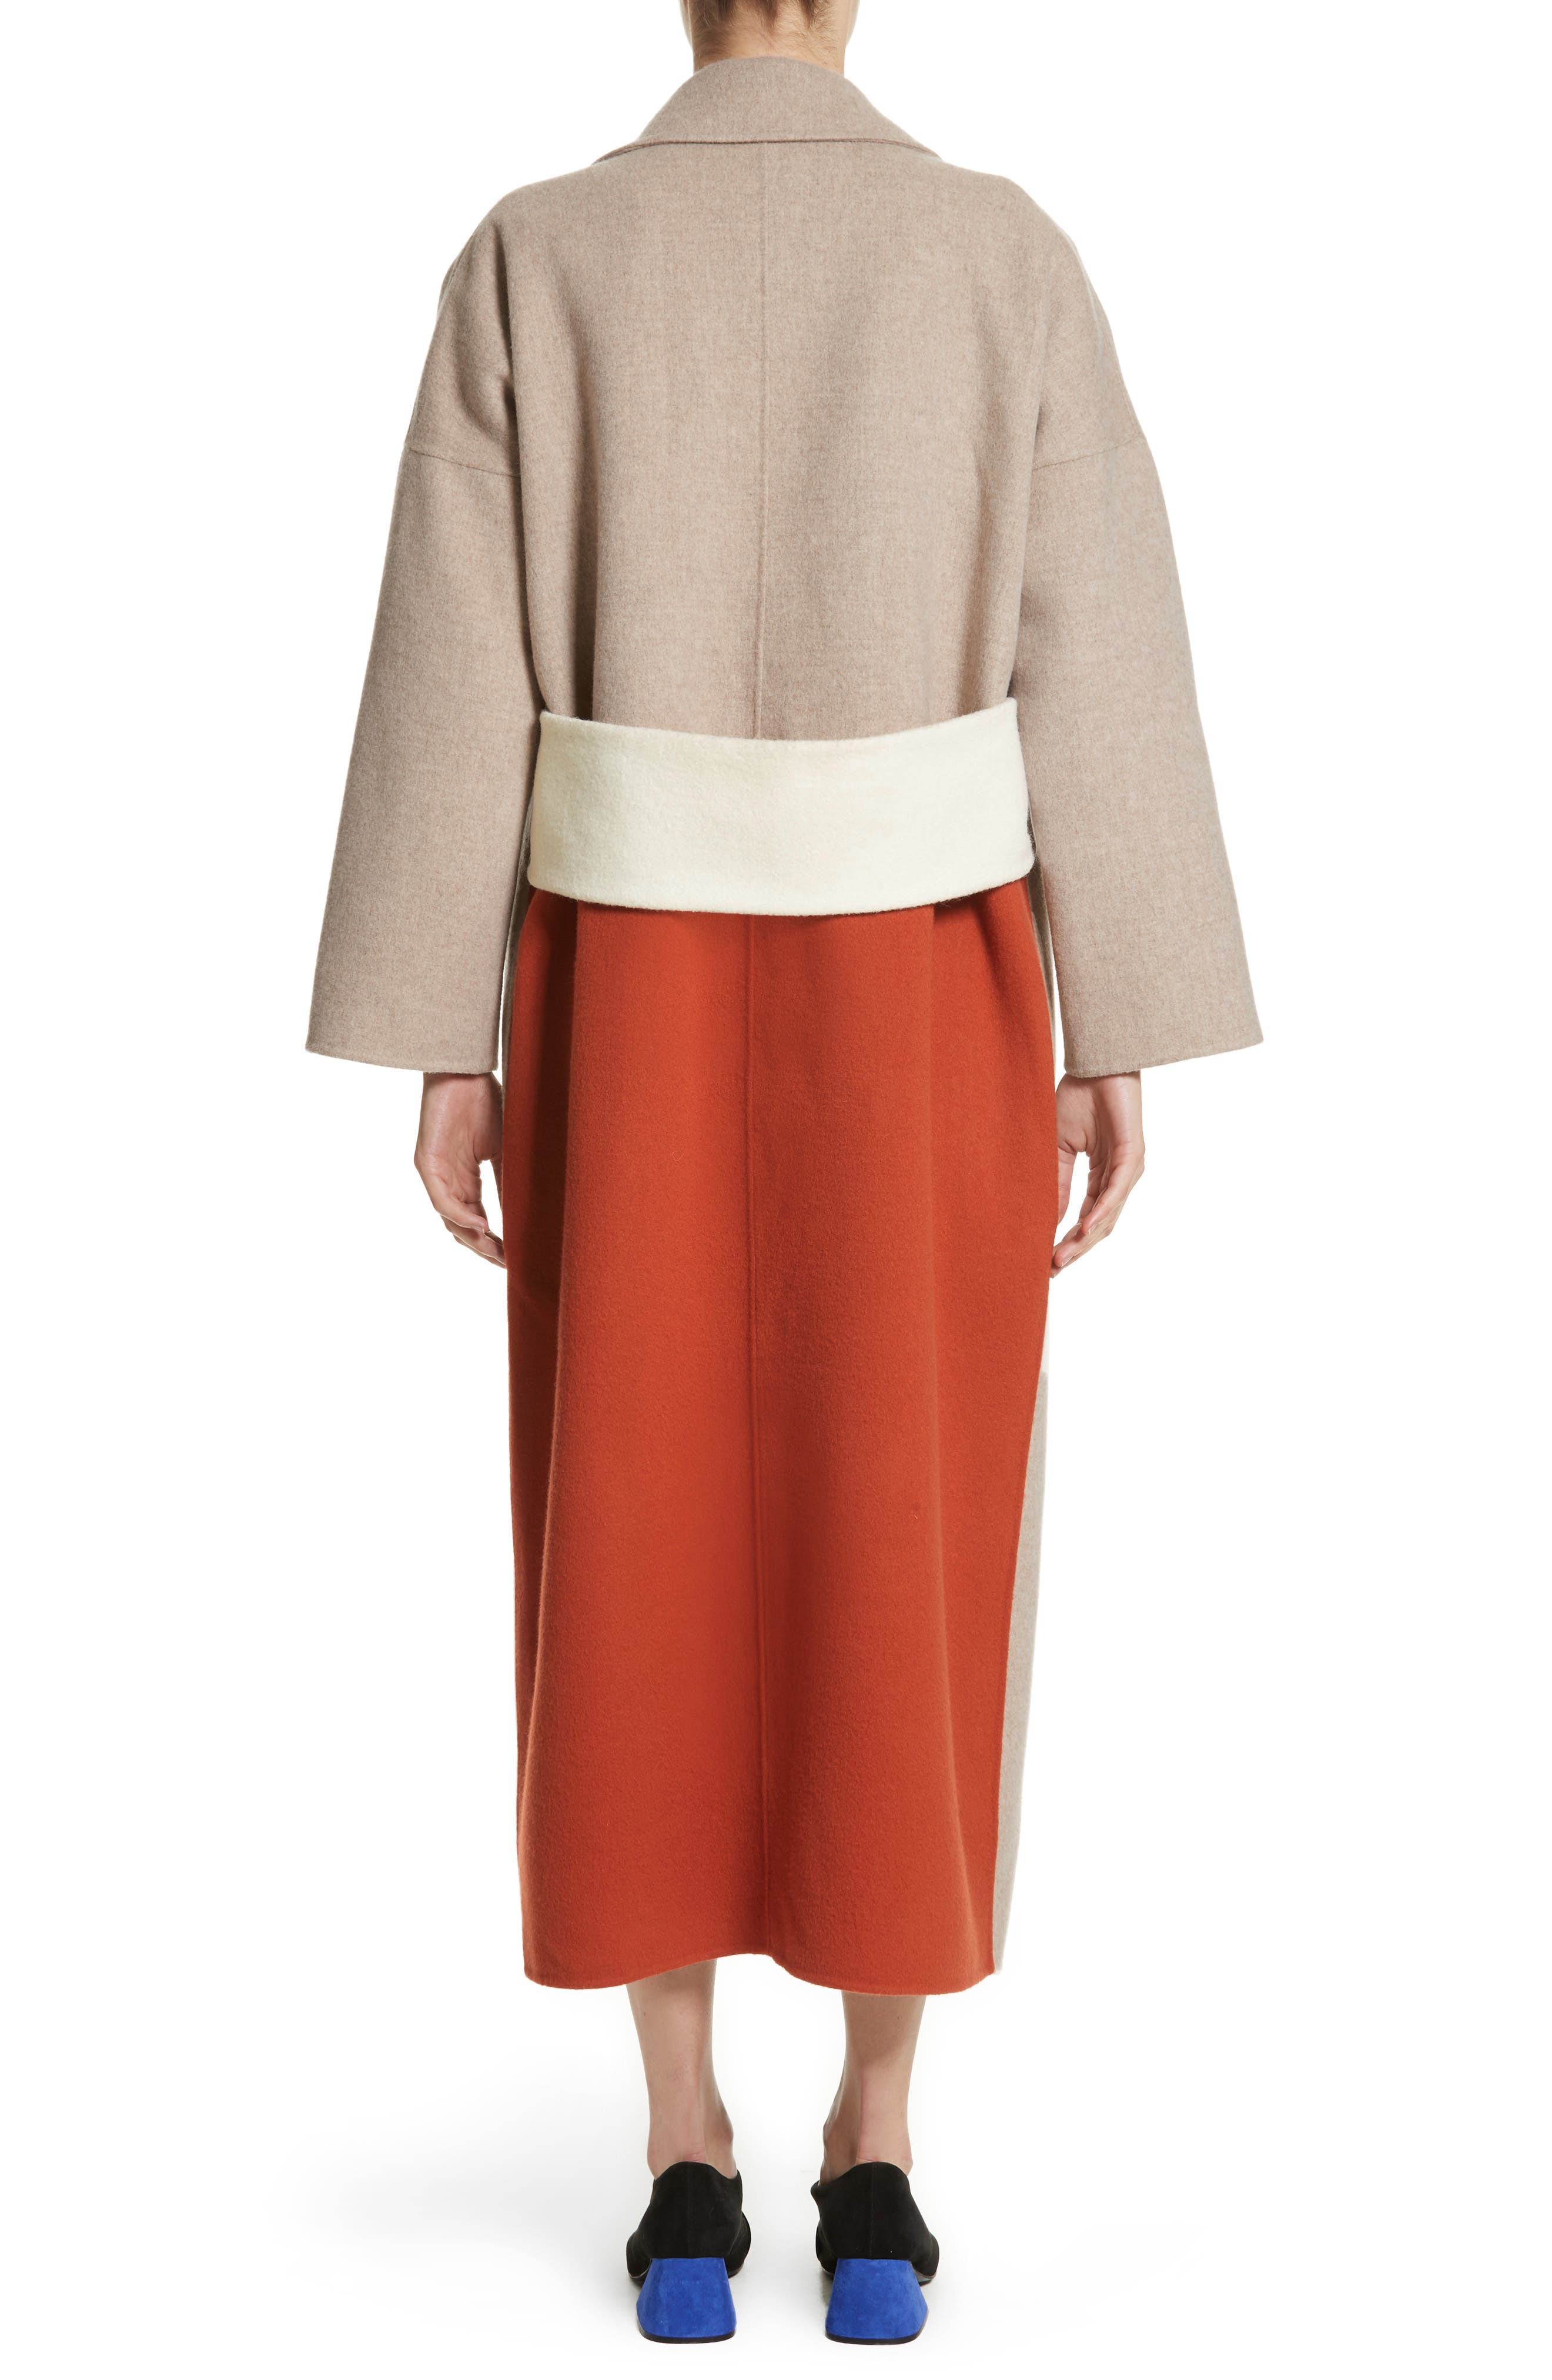 Kate Oversize Belted Coat,                             Alternate thumbnail 2, color,                             260